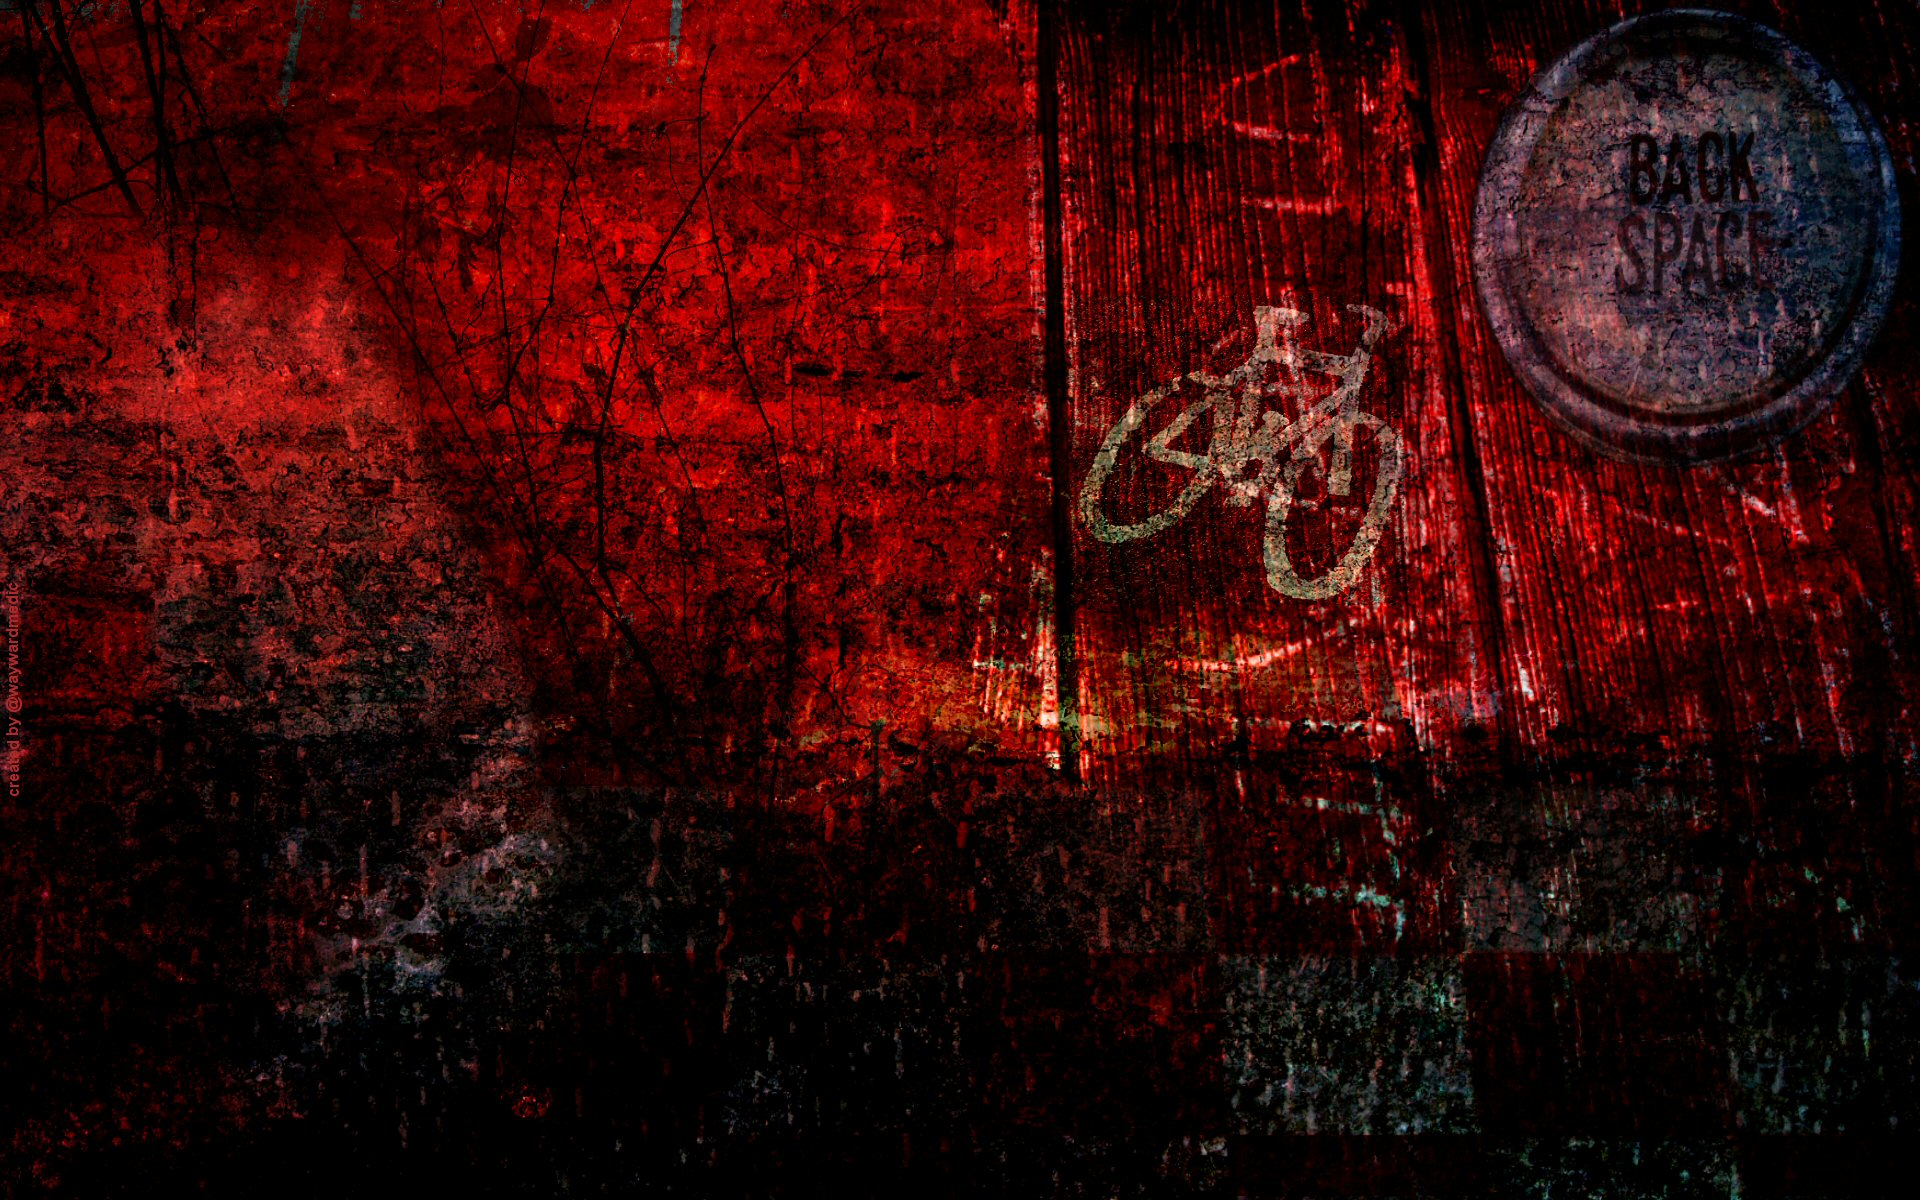 Red grunge twitter background by waywardmedic 1920x1200